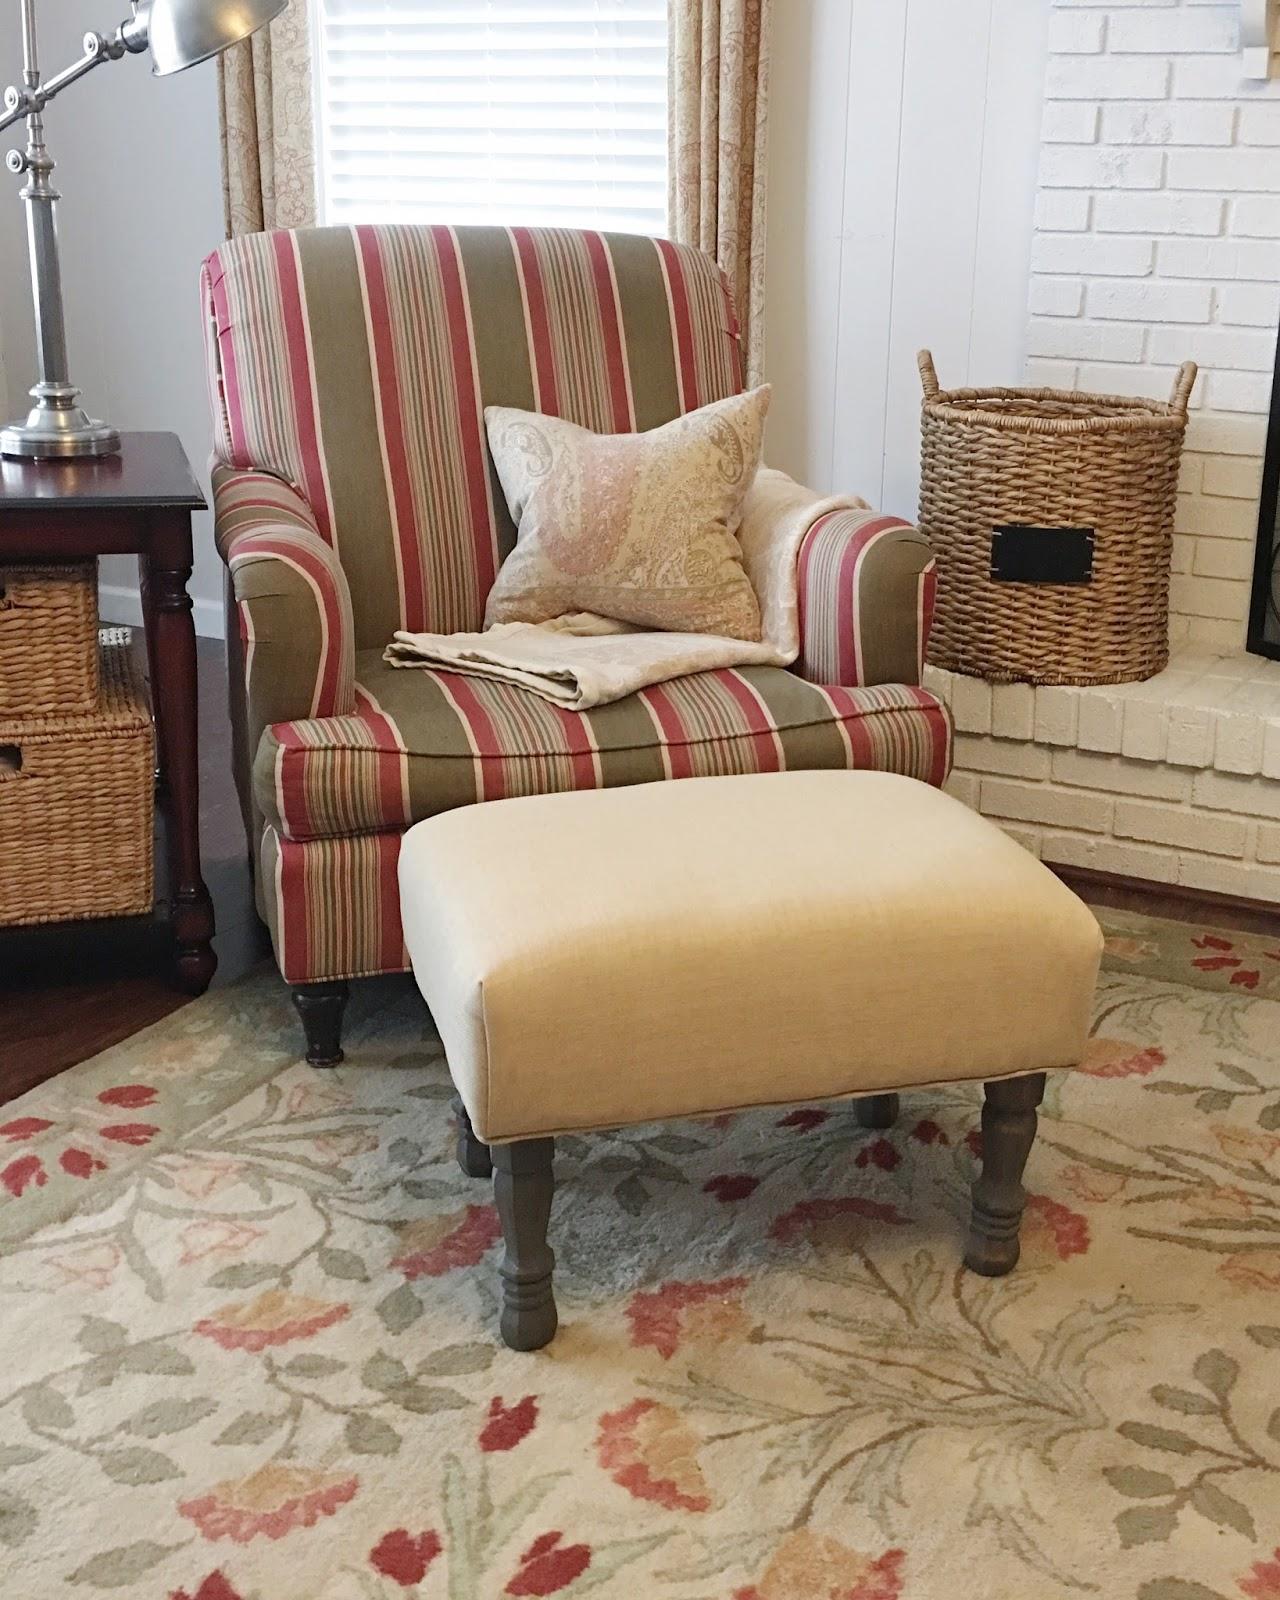 Build An Ottoman The Modest Homestead How To Make An Upholstered Ottoman